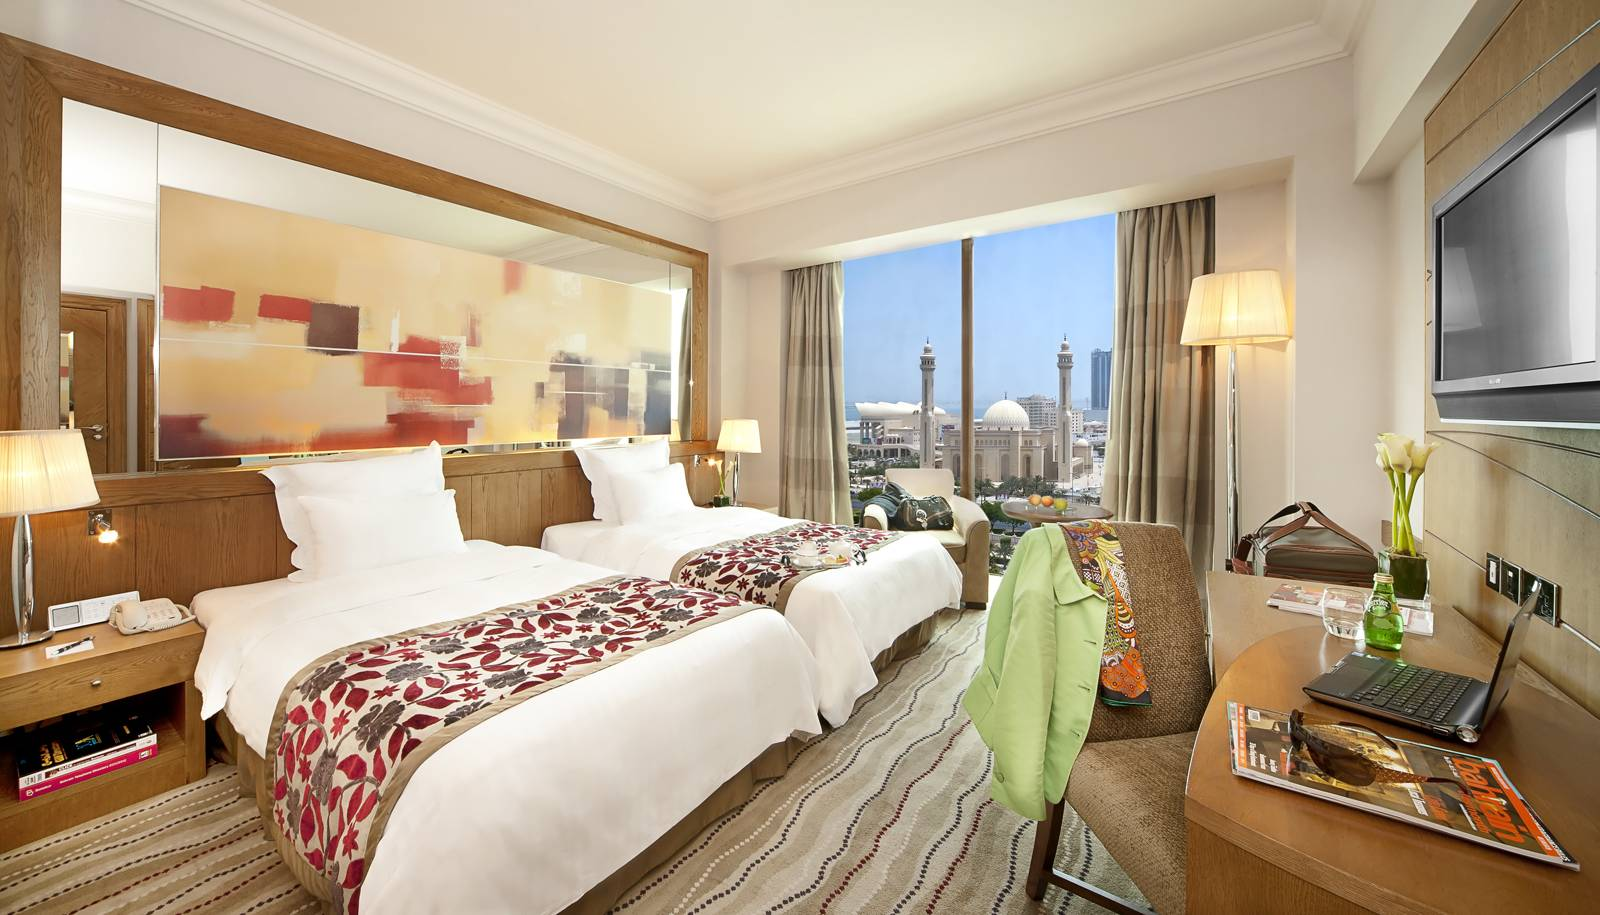 Fancy Hotel Rooms | www.imgkid.com - The Image Kid Has It!